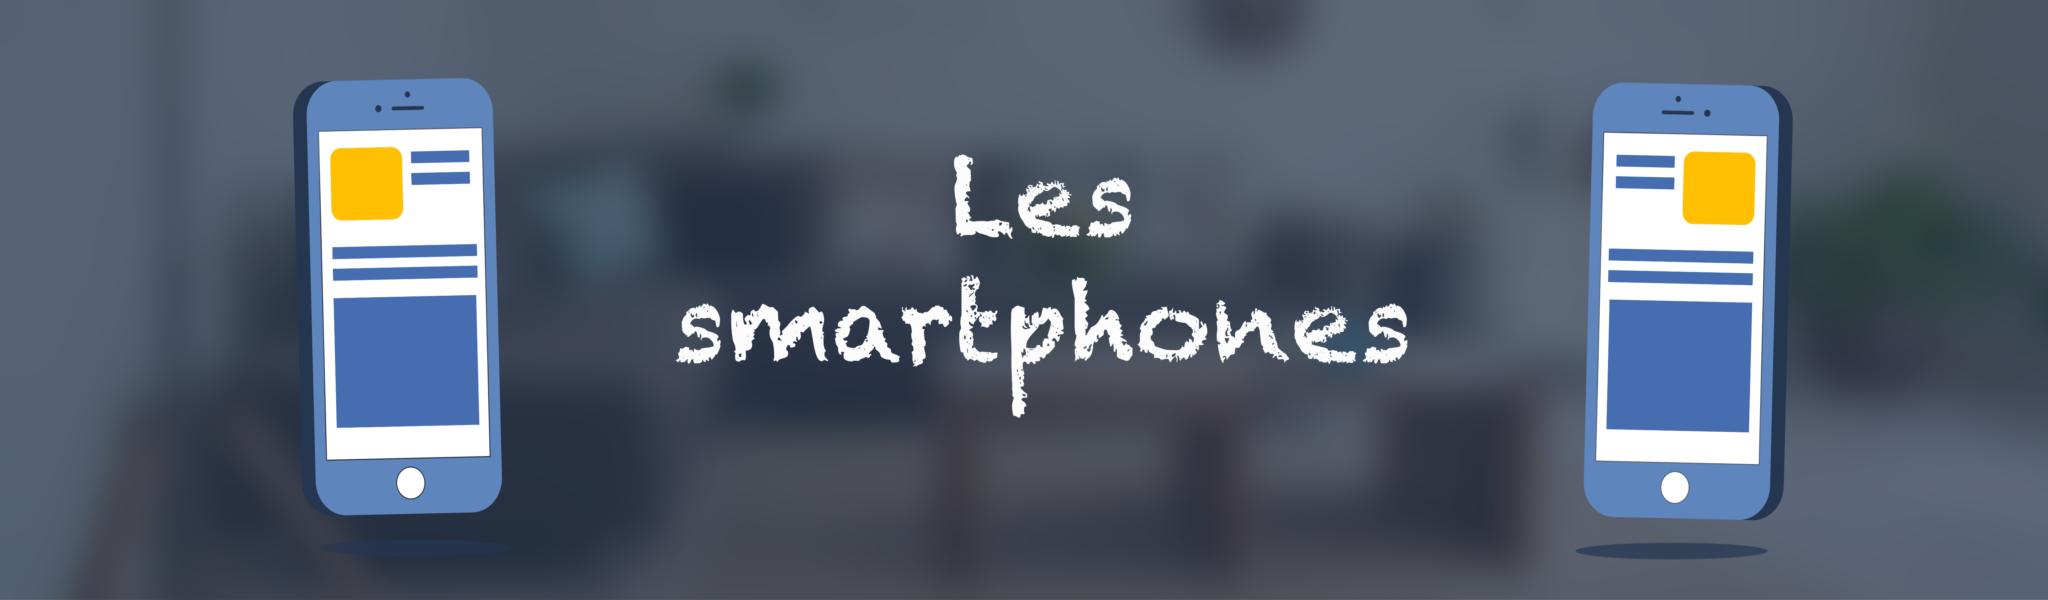 Smartphones 360 - Immobilier - Meilleure Visite